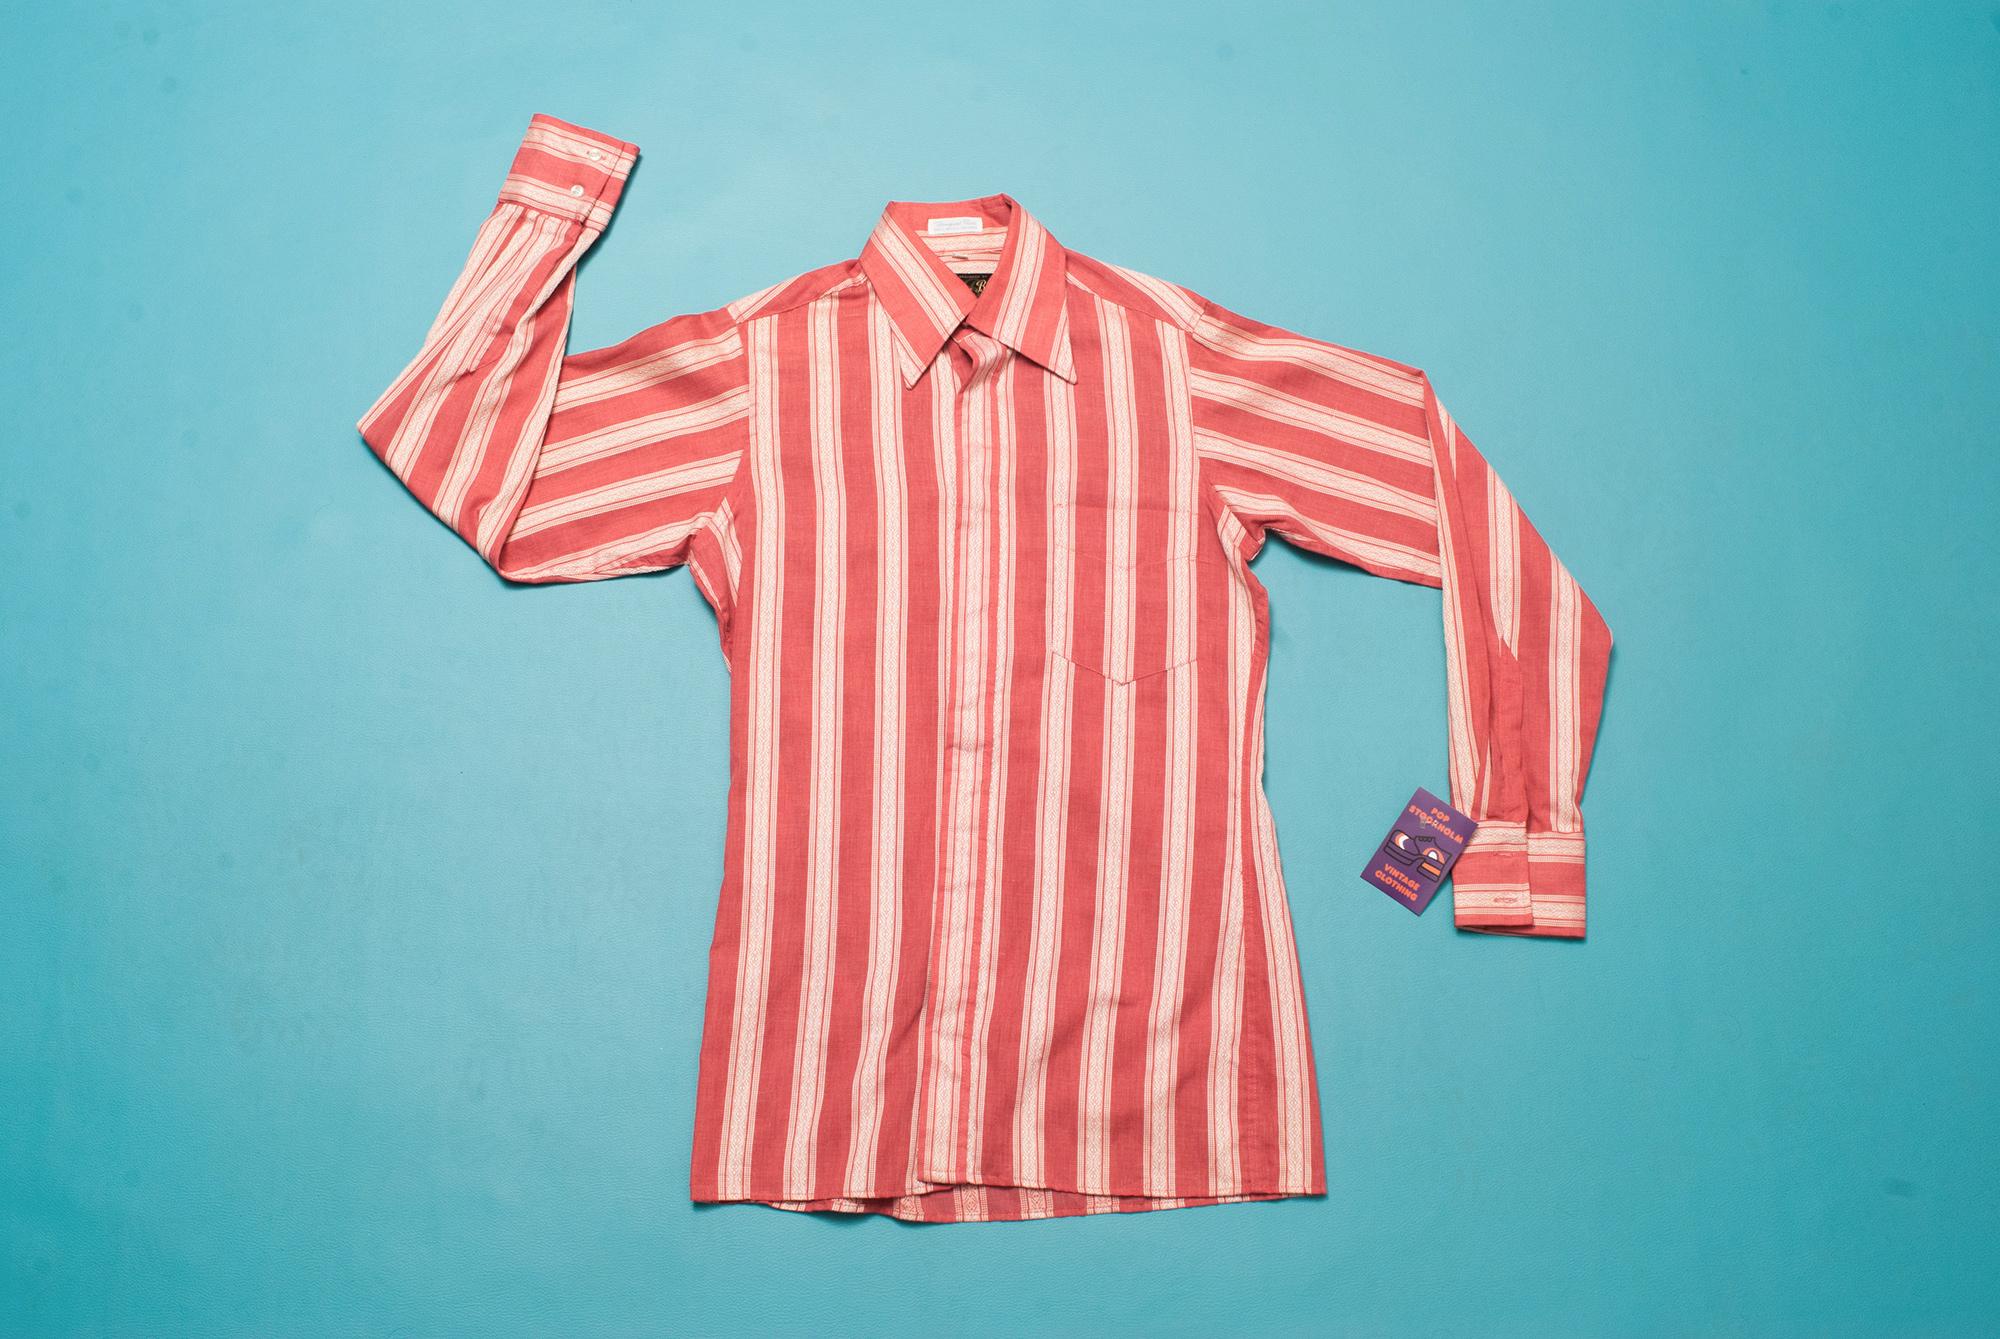 70's Stylish Single Needle Tailored Shirt